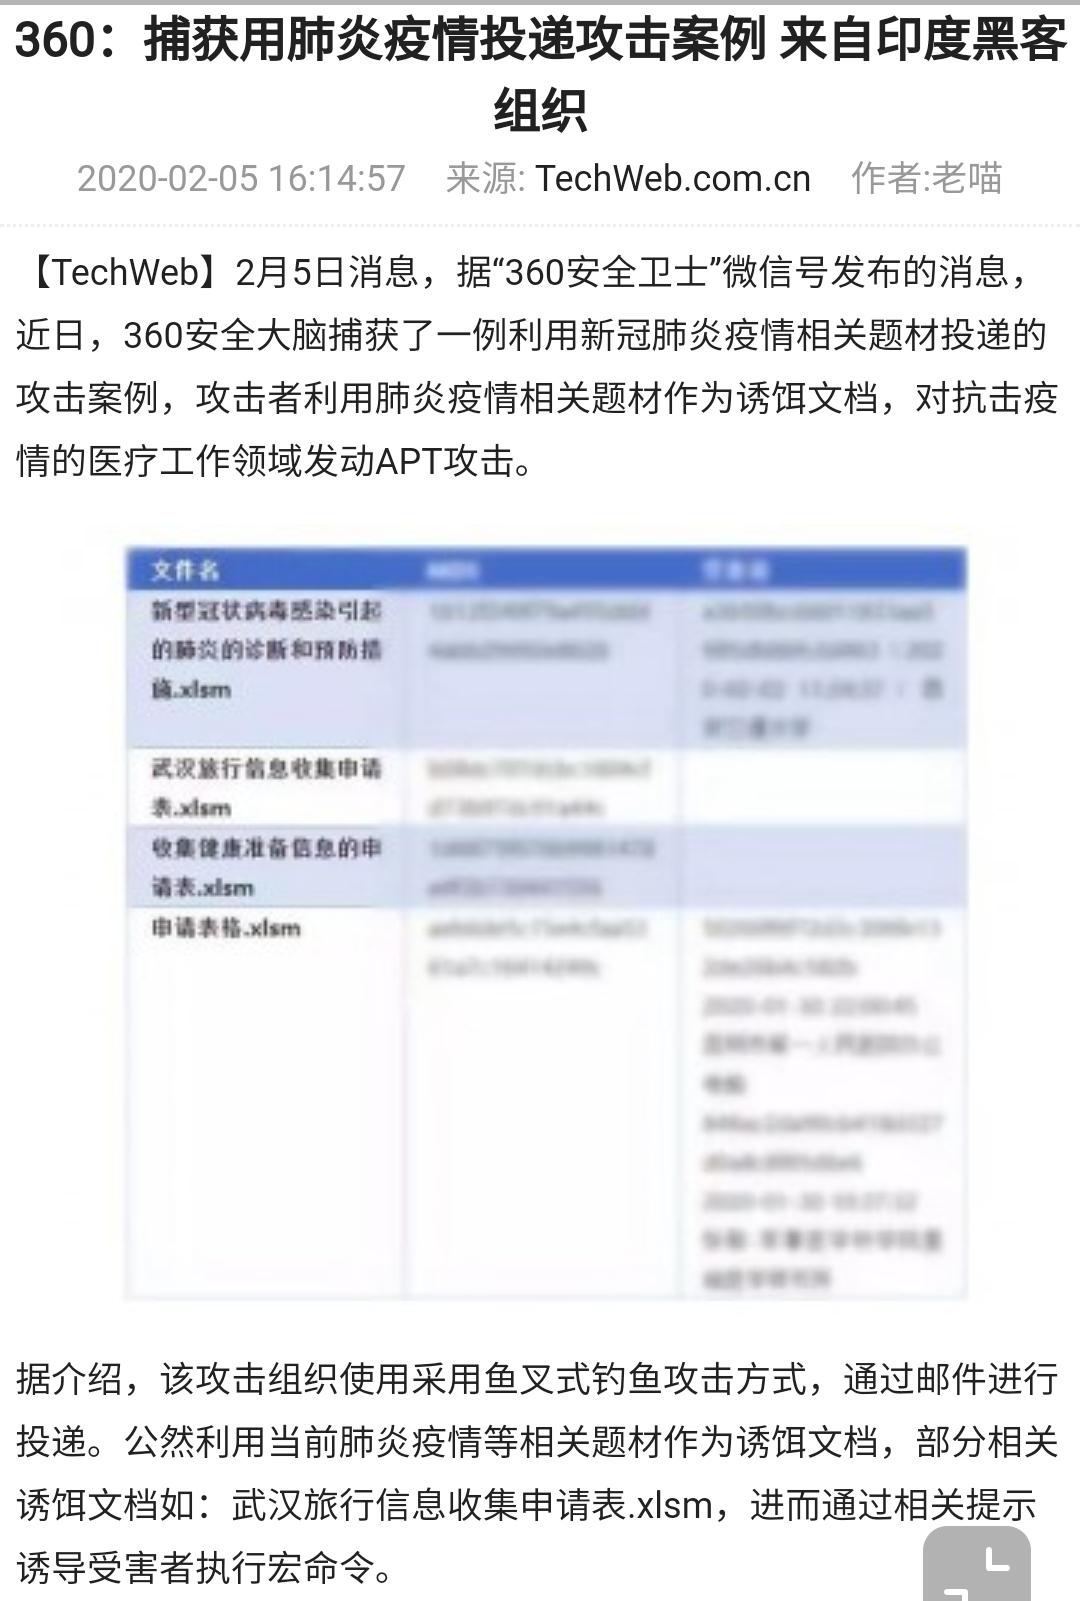 Screenshot_2020-02-08-10-22-15.png